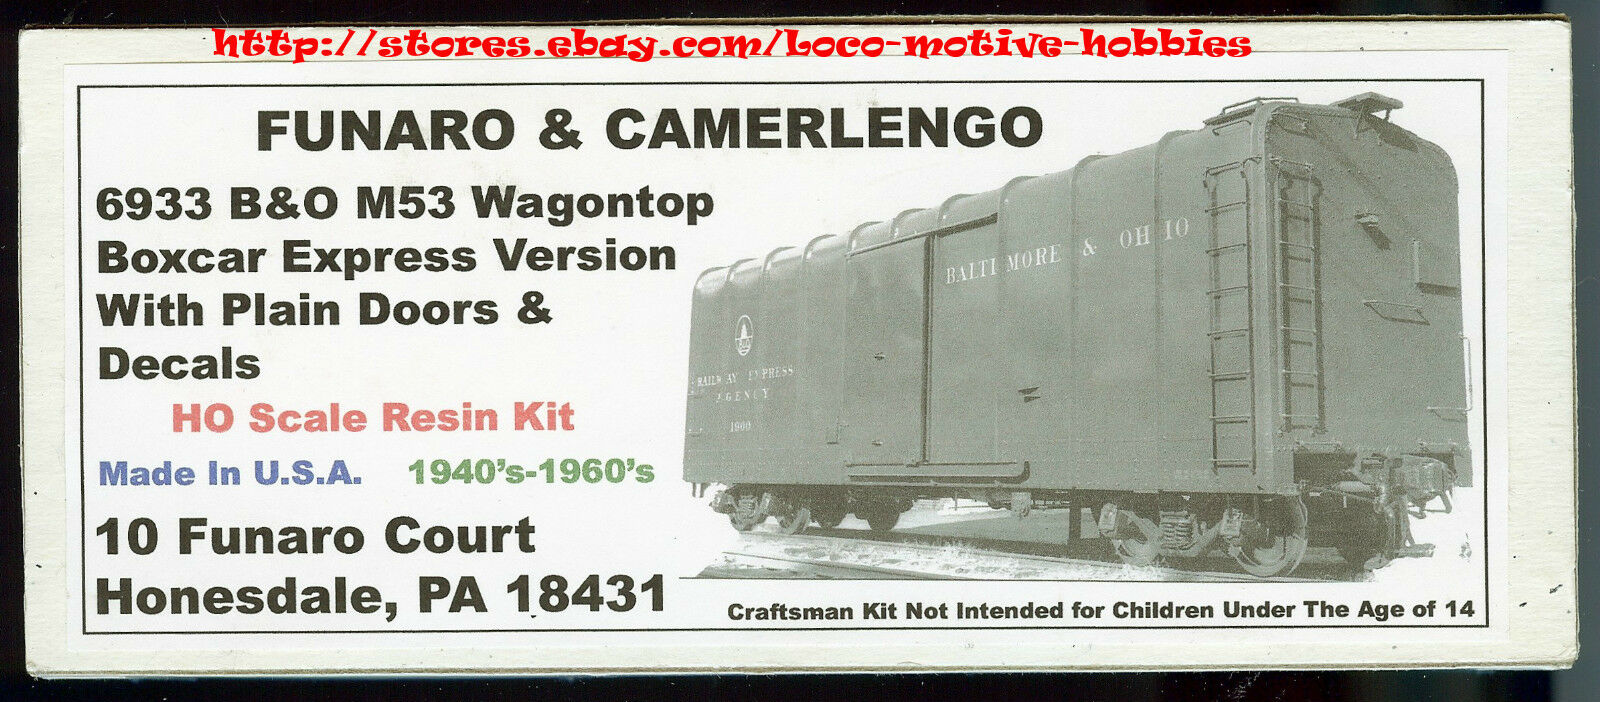 Funaro F&C 6933  BALTIMORE OHIO  WagonTop B&O M53 EXPRESS Boxcar 1-PIECE BODY